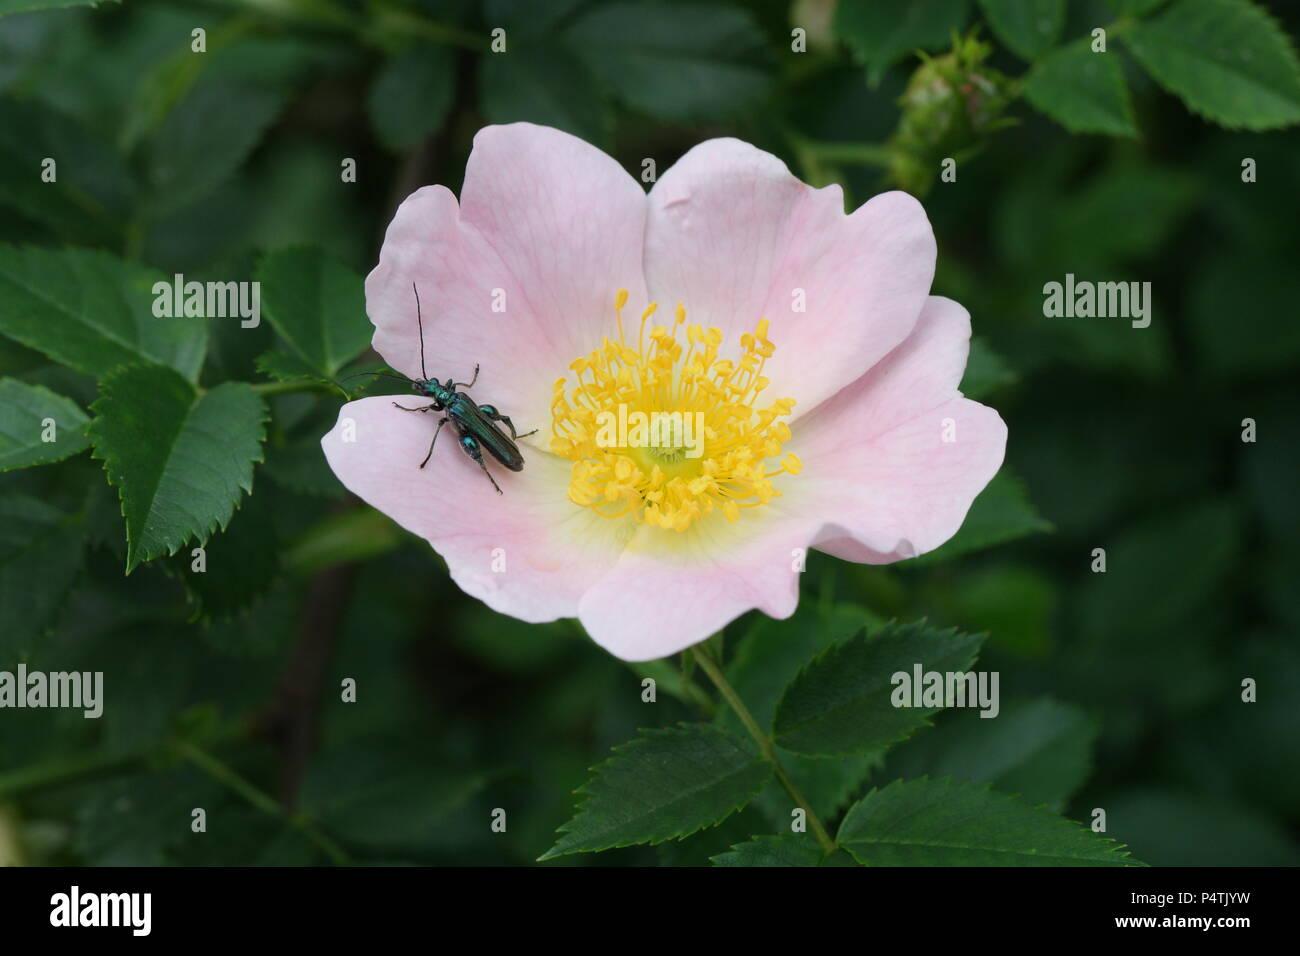 Rosa canina (Dog Rose / Hunds-Rose, Hundsrose, Heckenrose) & Oedemera nobilis (False Oil Beetle / Grüner Scheinbockkäfer) - Stock Image